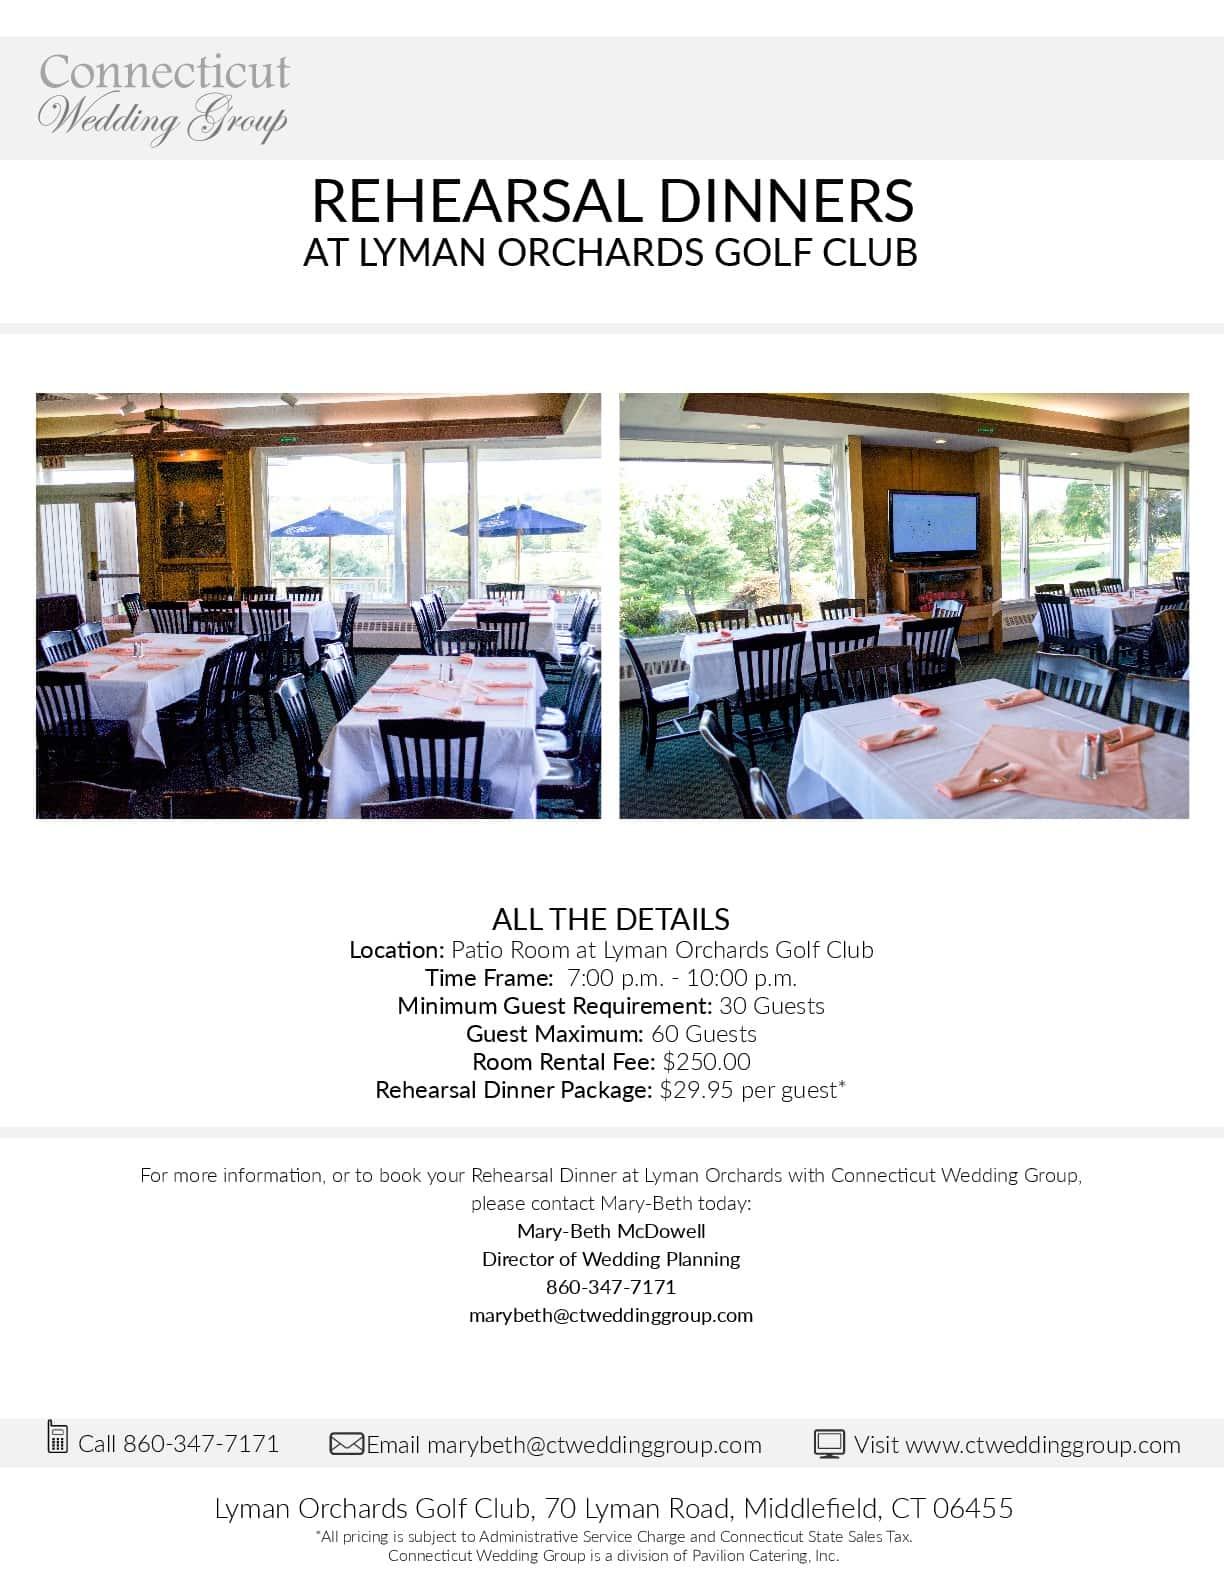 Lyman-Orchards-olf-Club-Rehearsal-Dinner-Menu-01-001